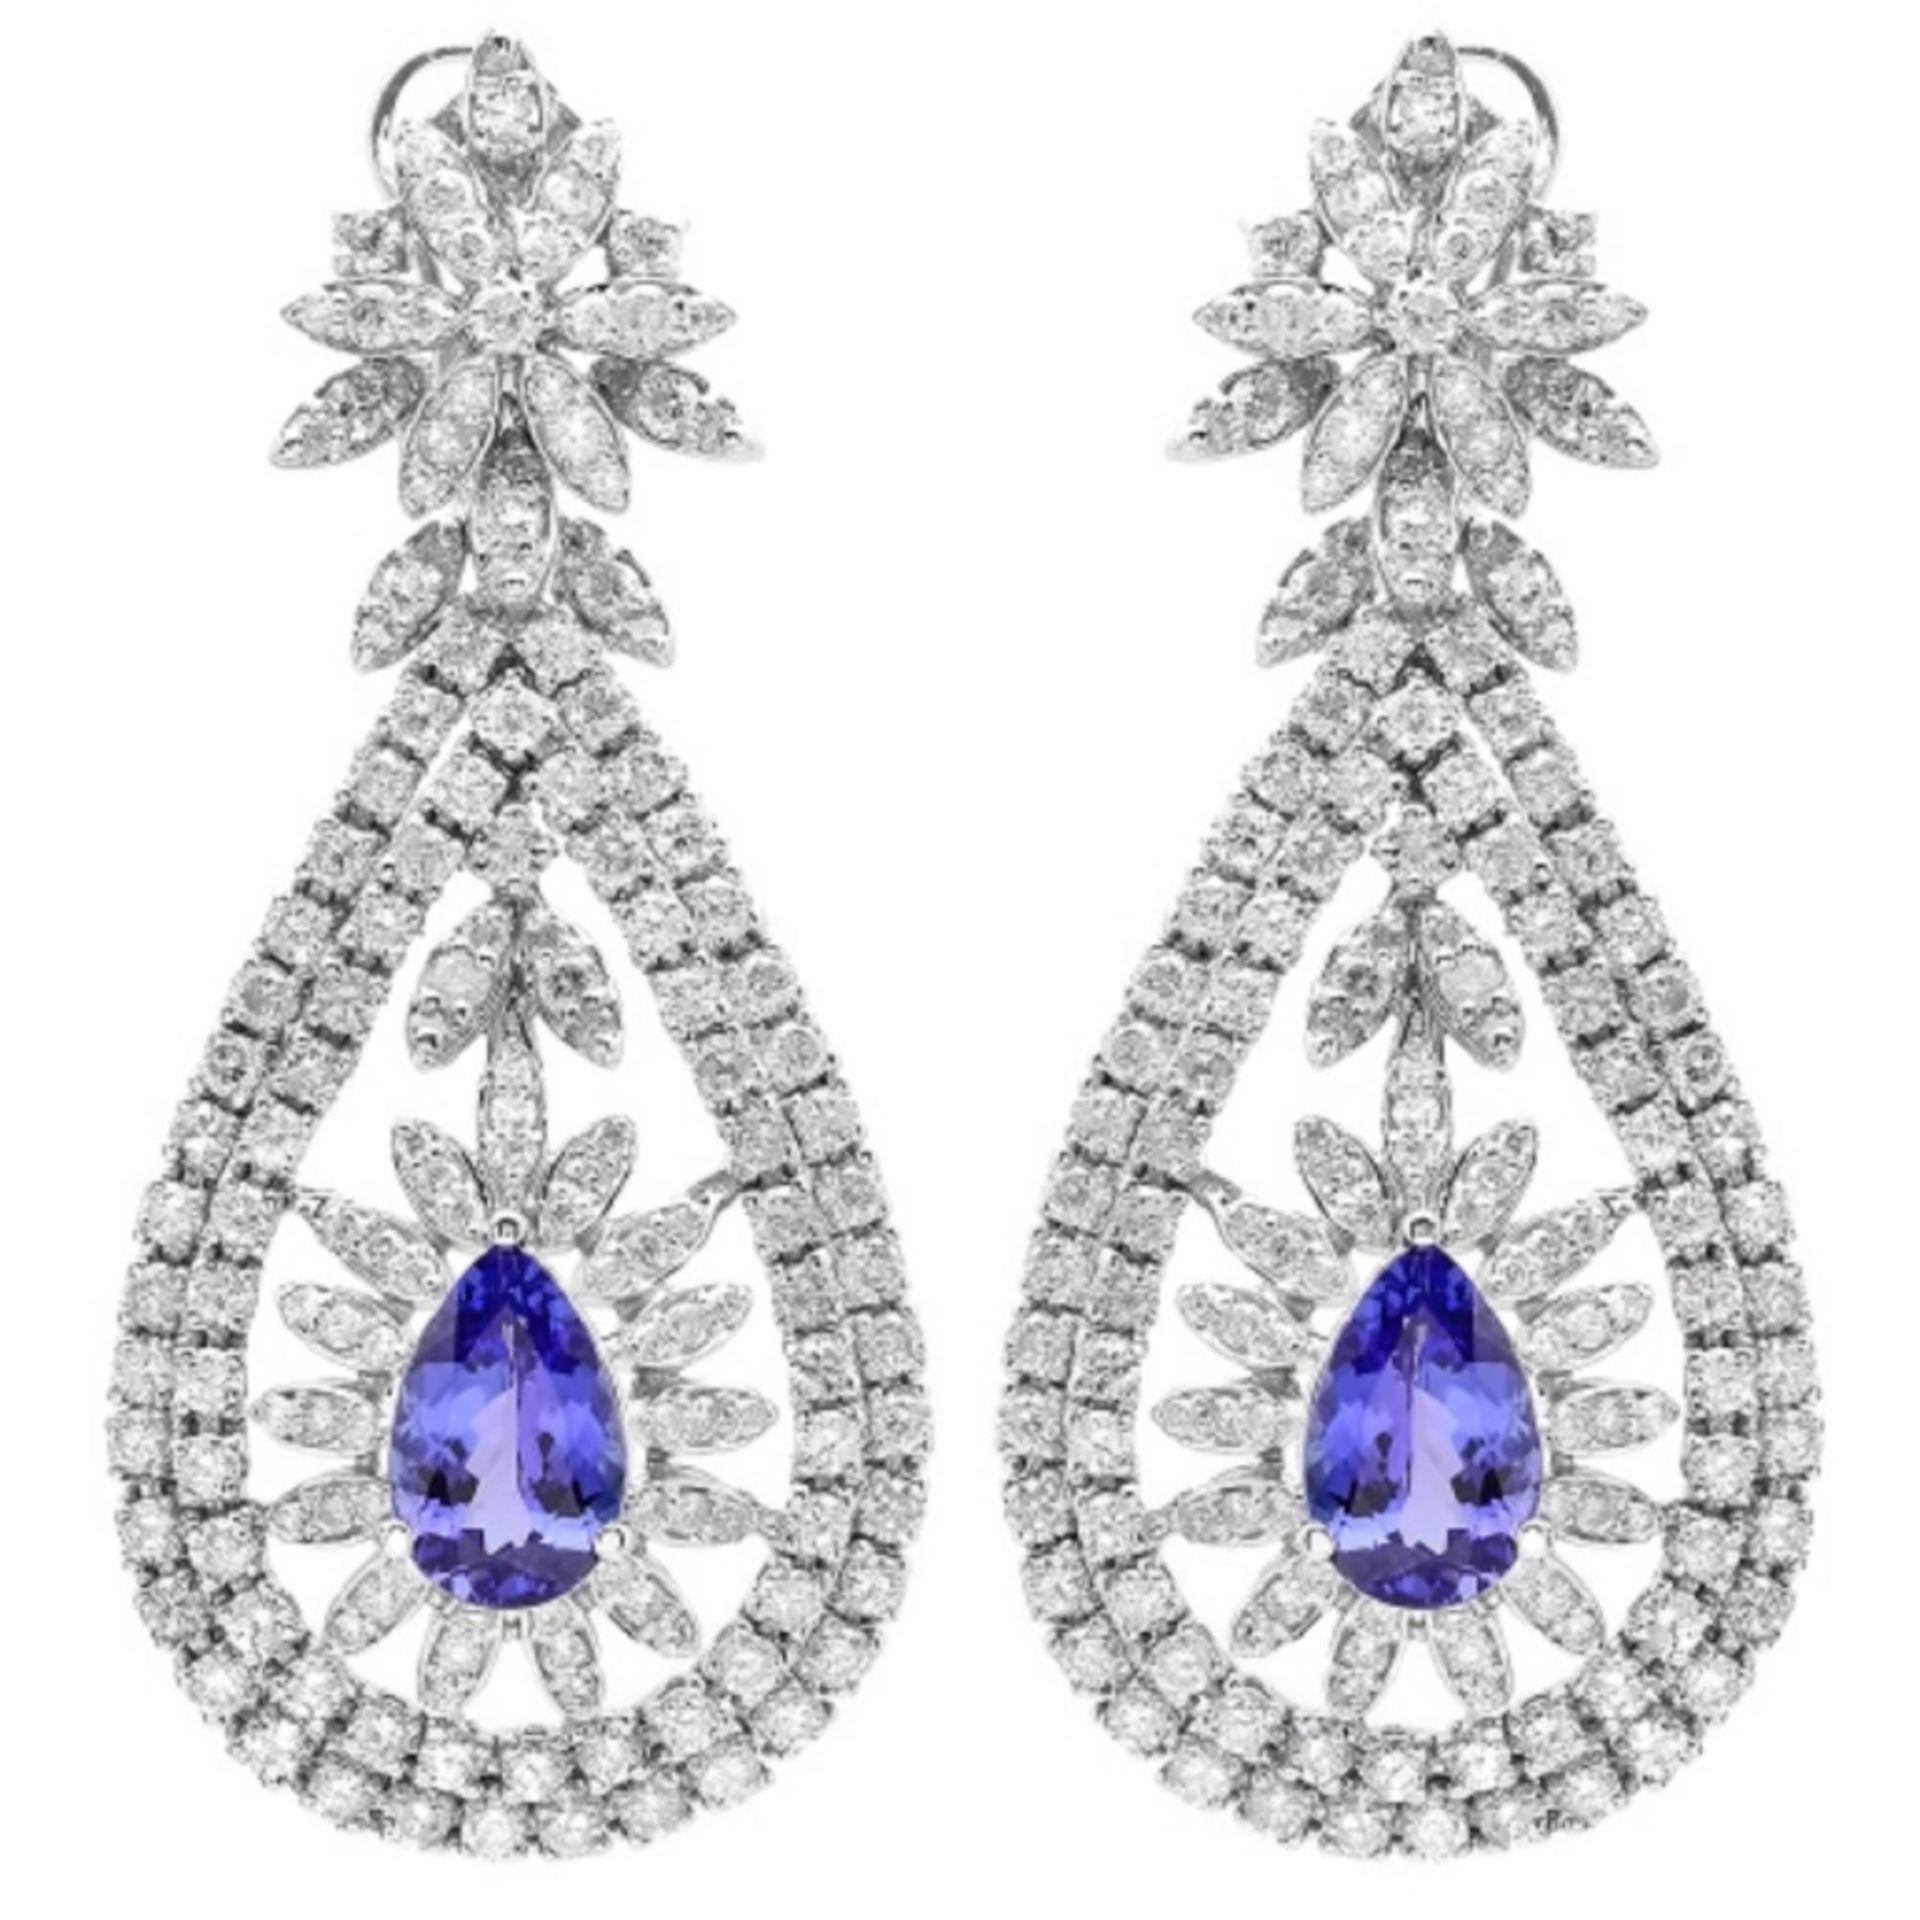 14K Gold 6.00ct Tanzanite & 7.20ct Diamond Earring